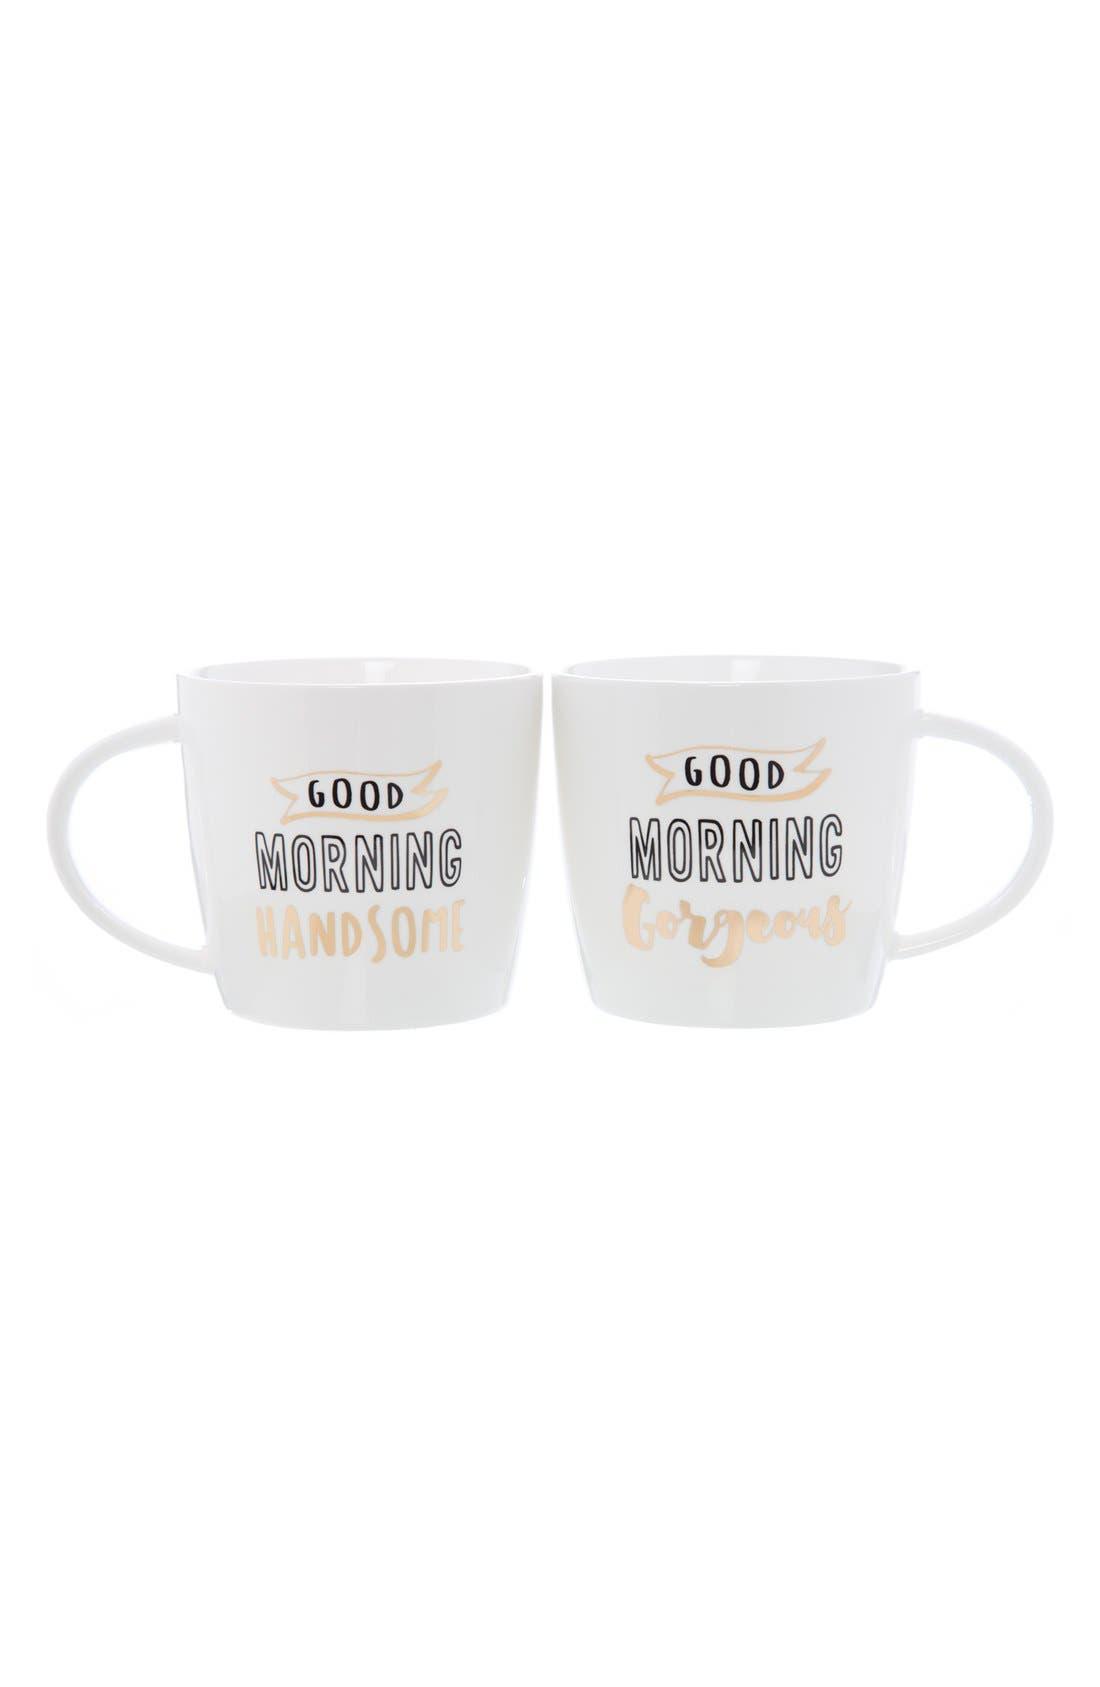 Slant Collections 'Good Morning' Ceramic Coffee Mugs (Set of 2)